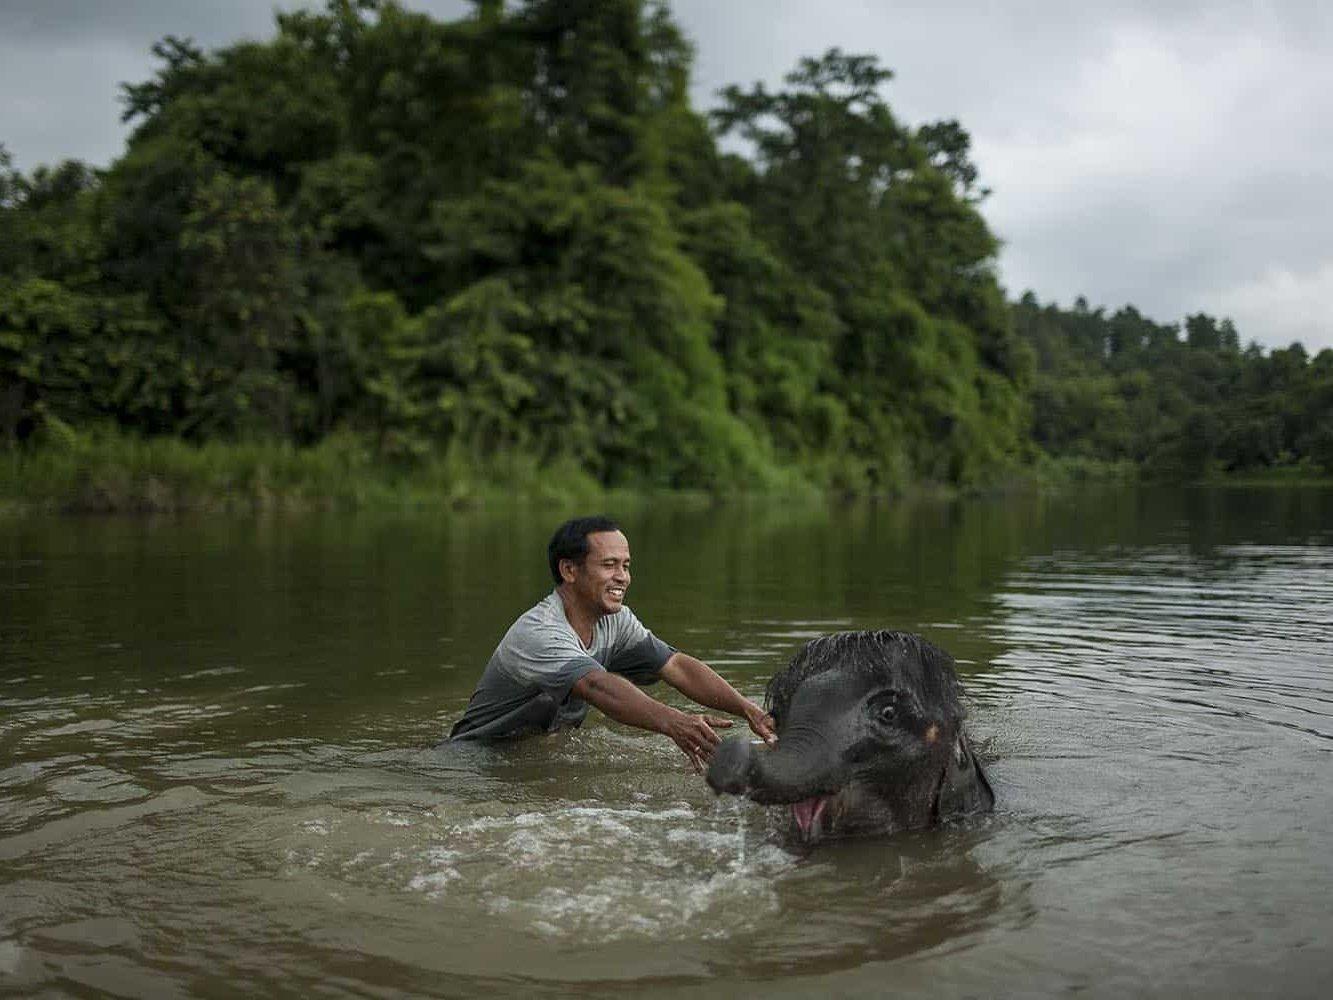 vietnam photographer mahout family binhdang 17